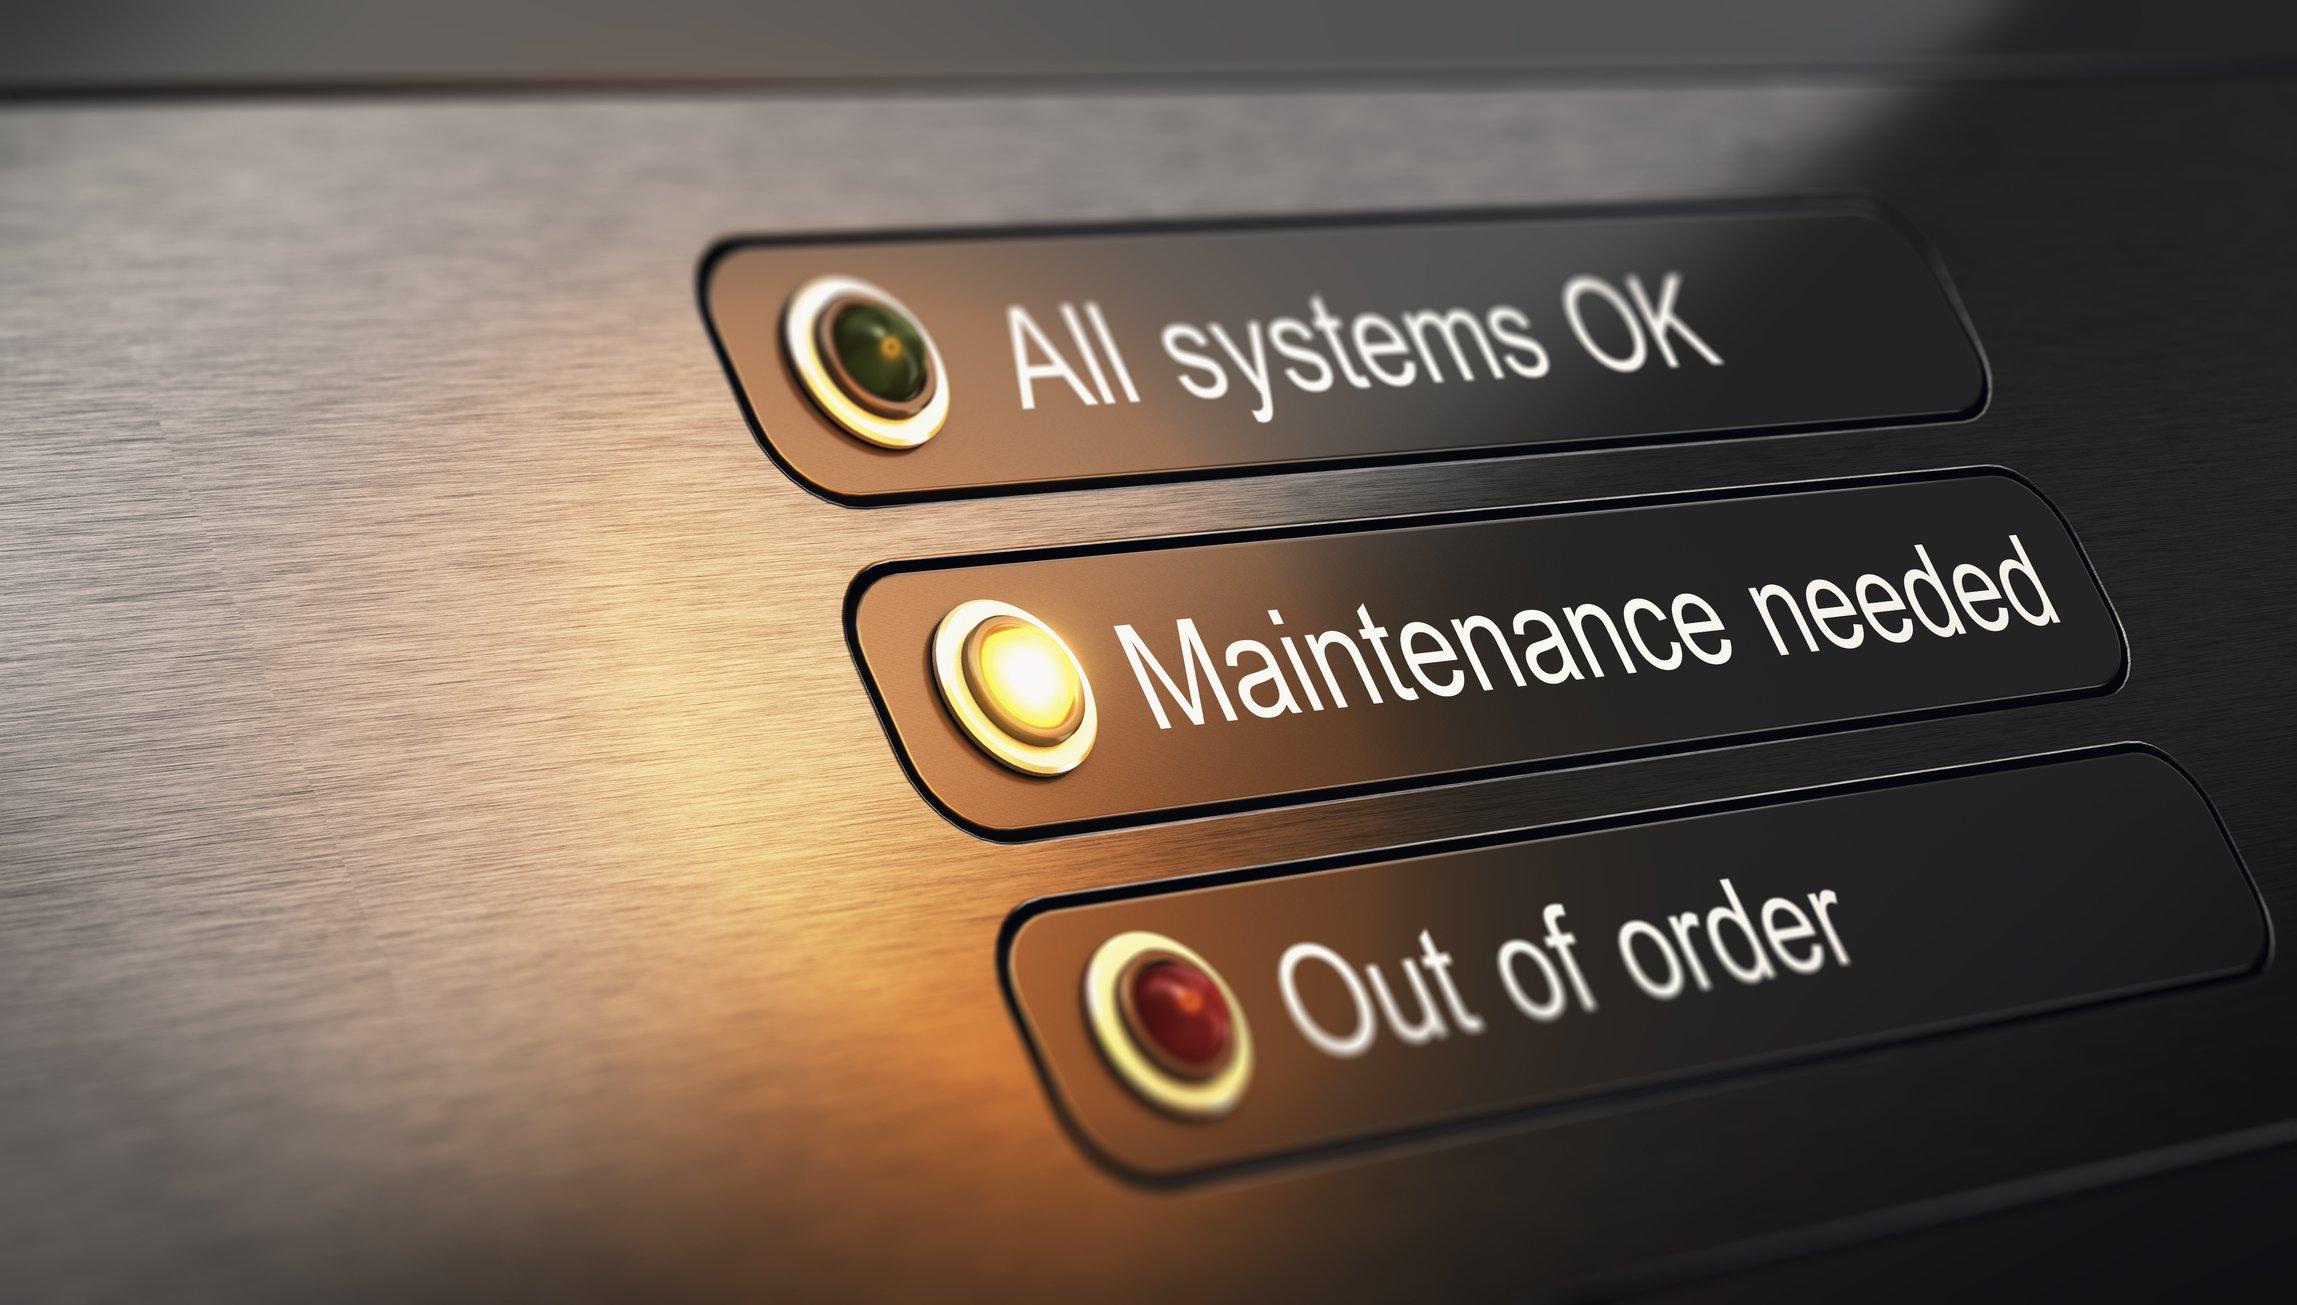 PPM (Preventative Planned Maintenance)